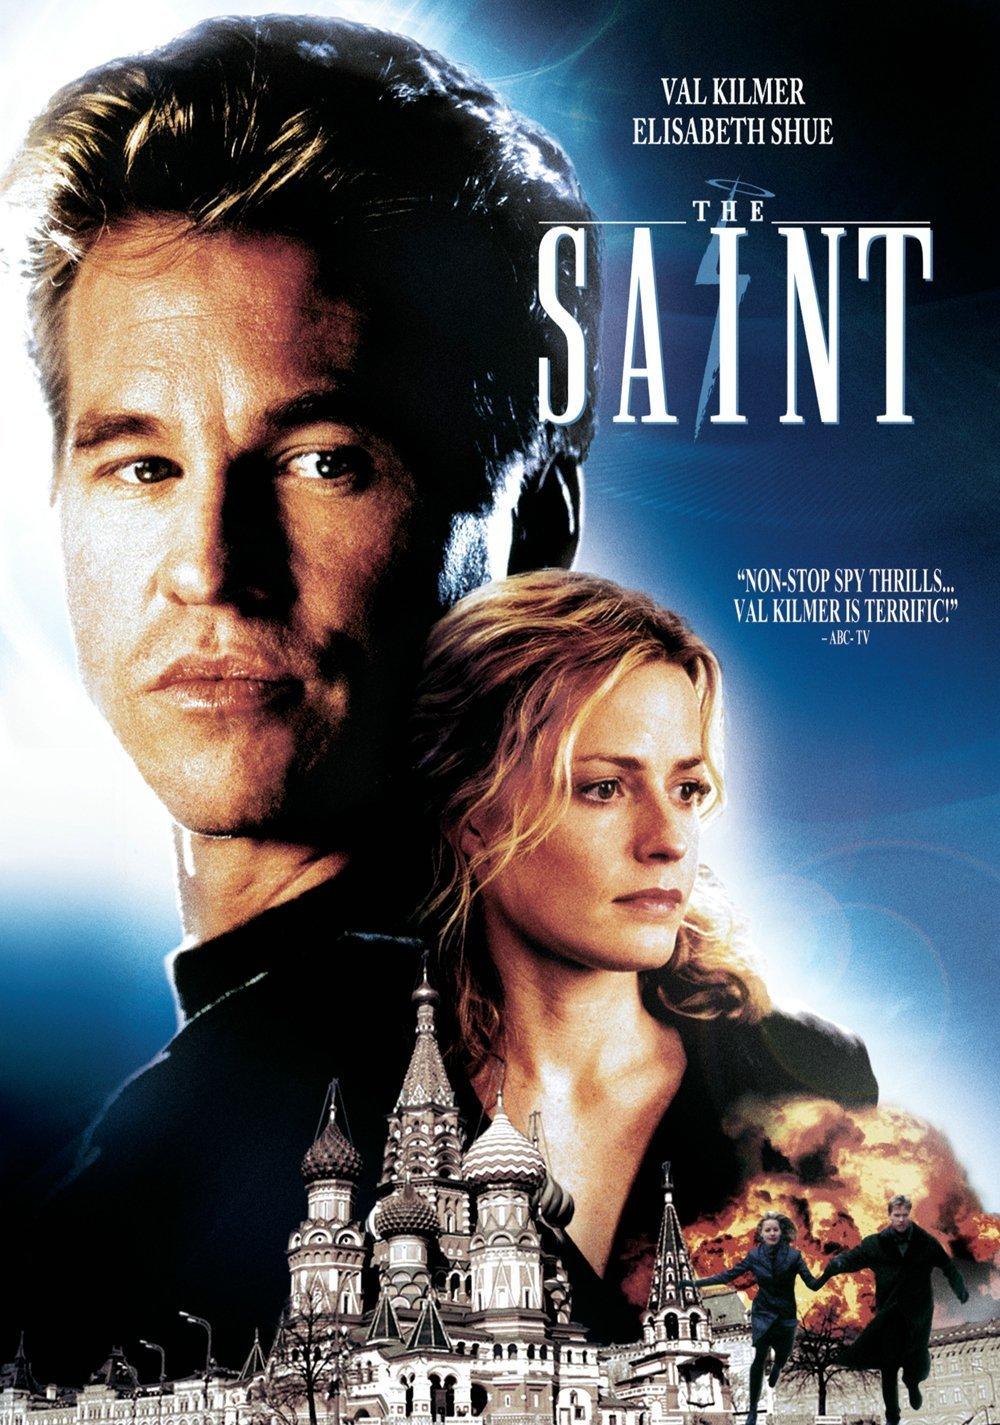 THE SAINT - Film del 2017